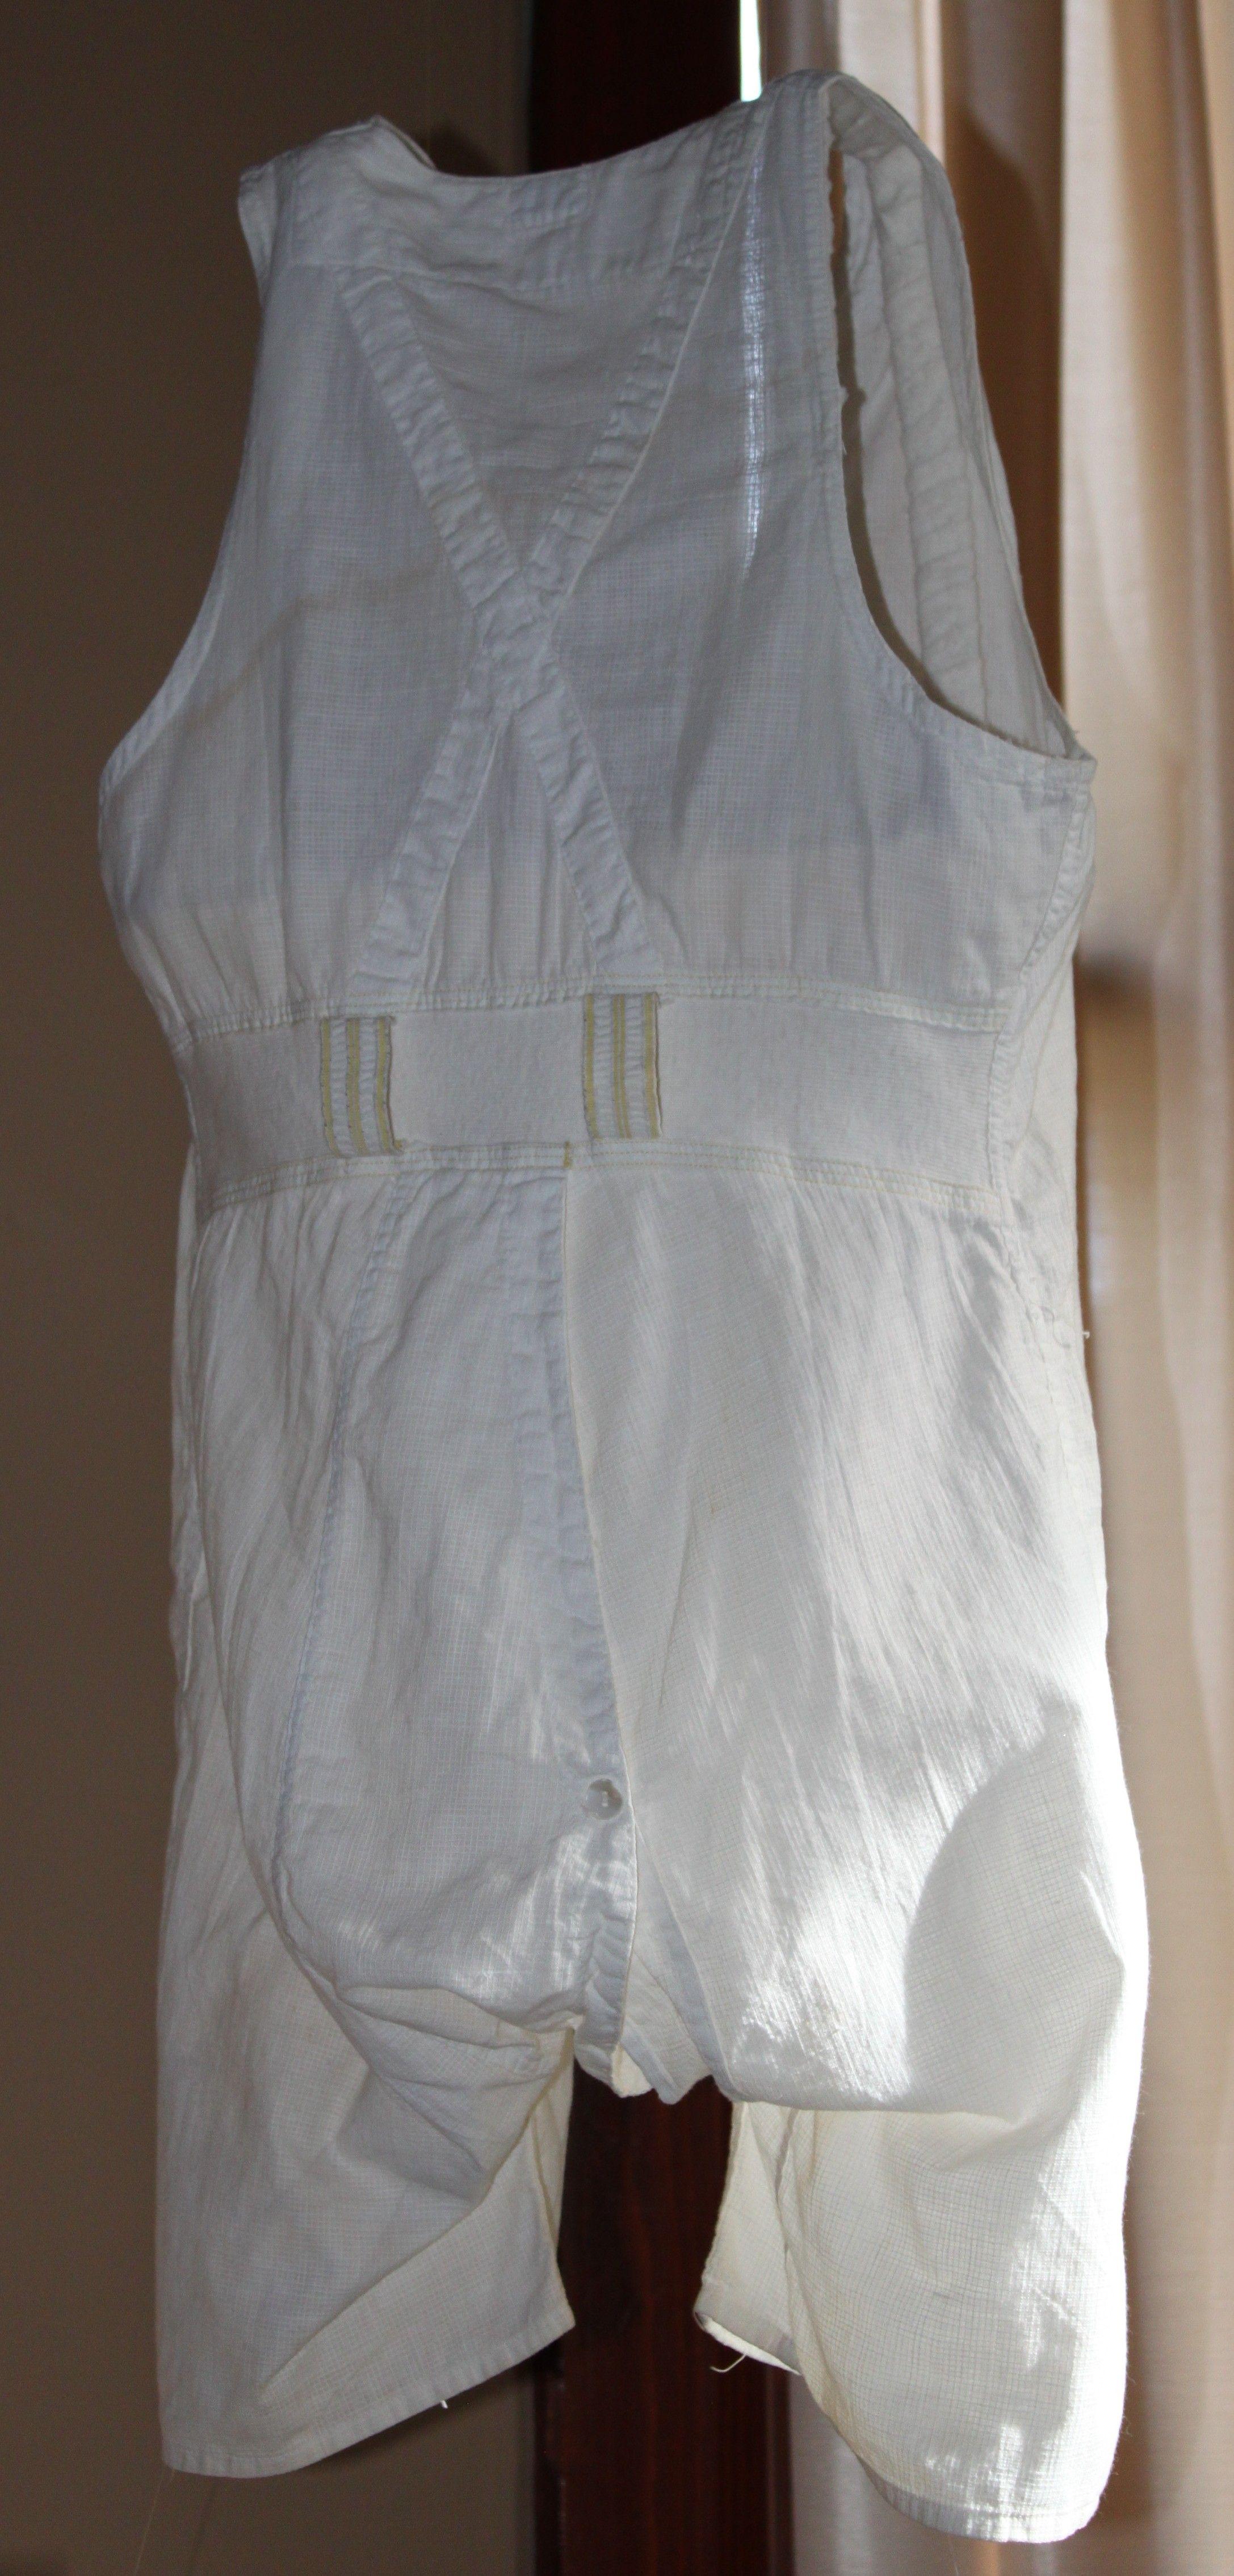 Men's Combination Underwear, undated The men's combination ...